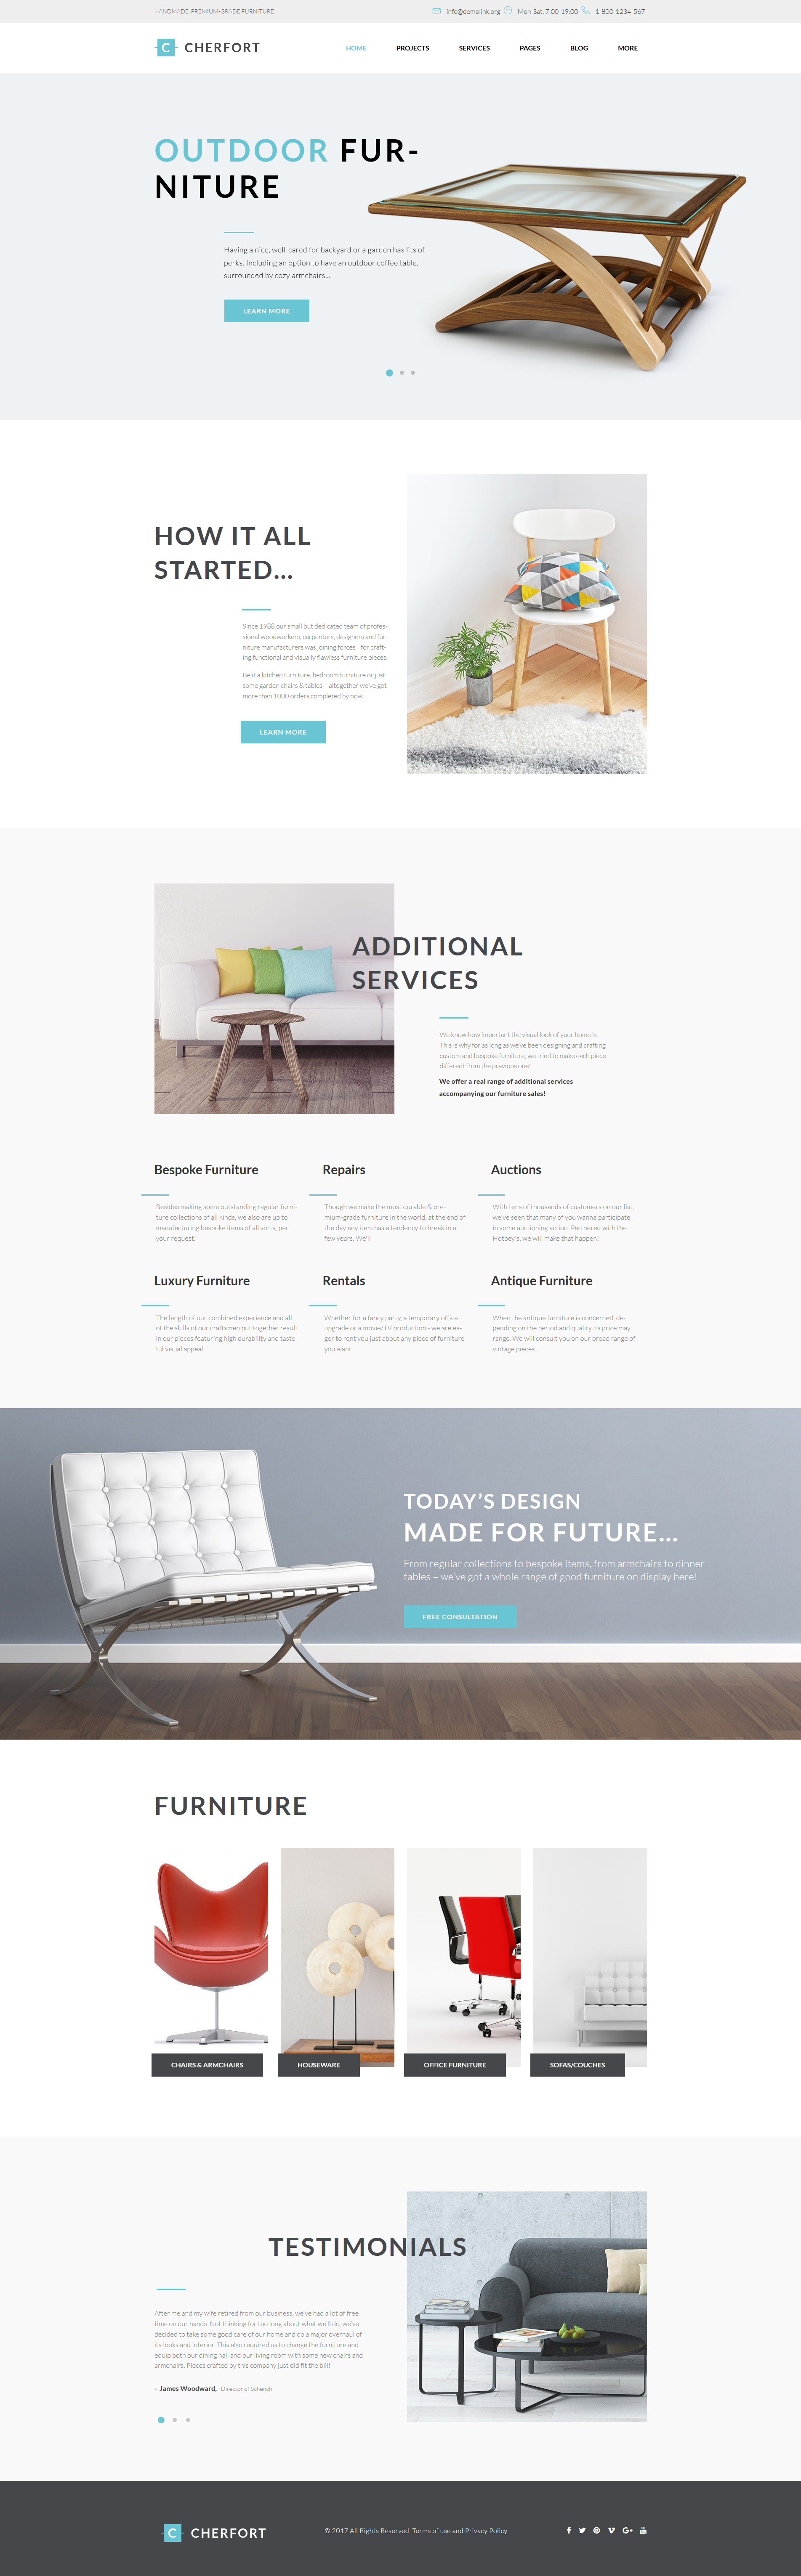 Адаптивный шаблон сайта на тему мебель #64097